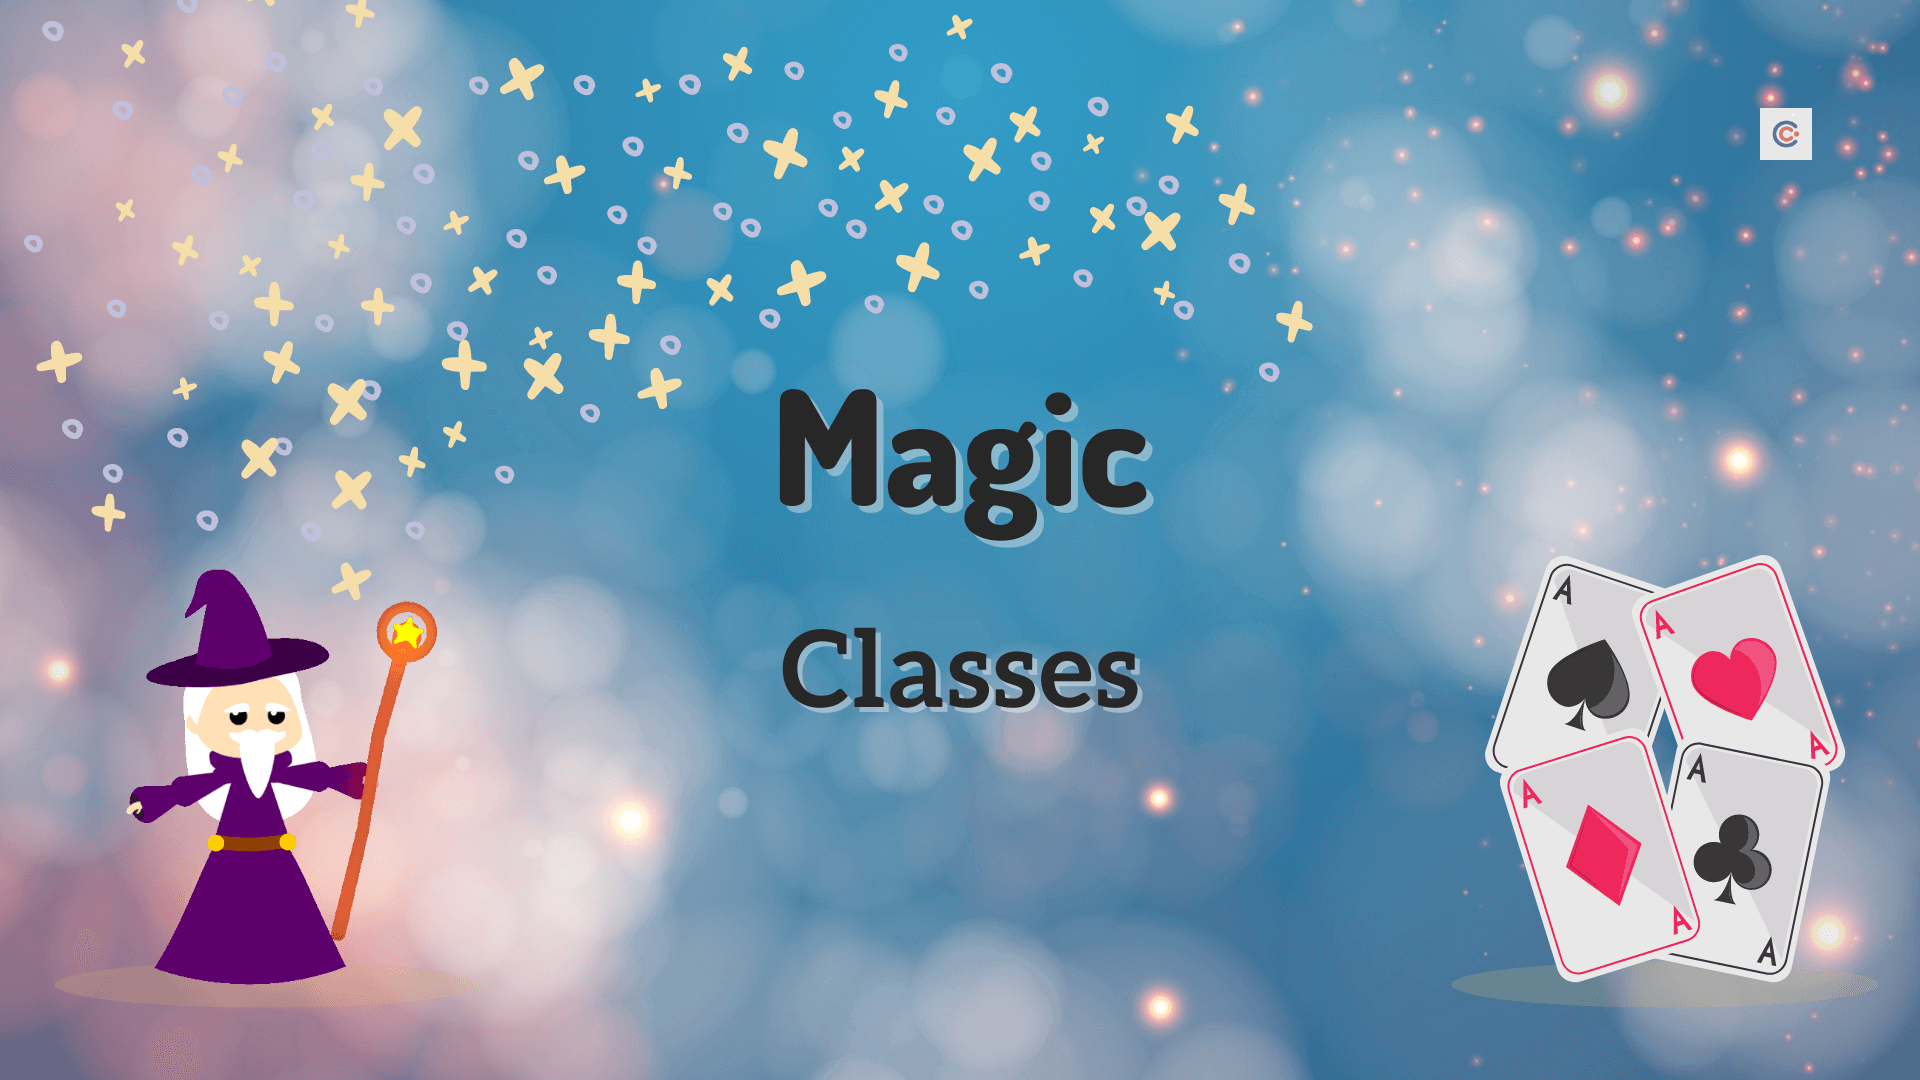 5 Best Magic Classes - Learn Magic Online